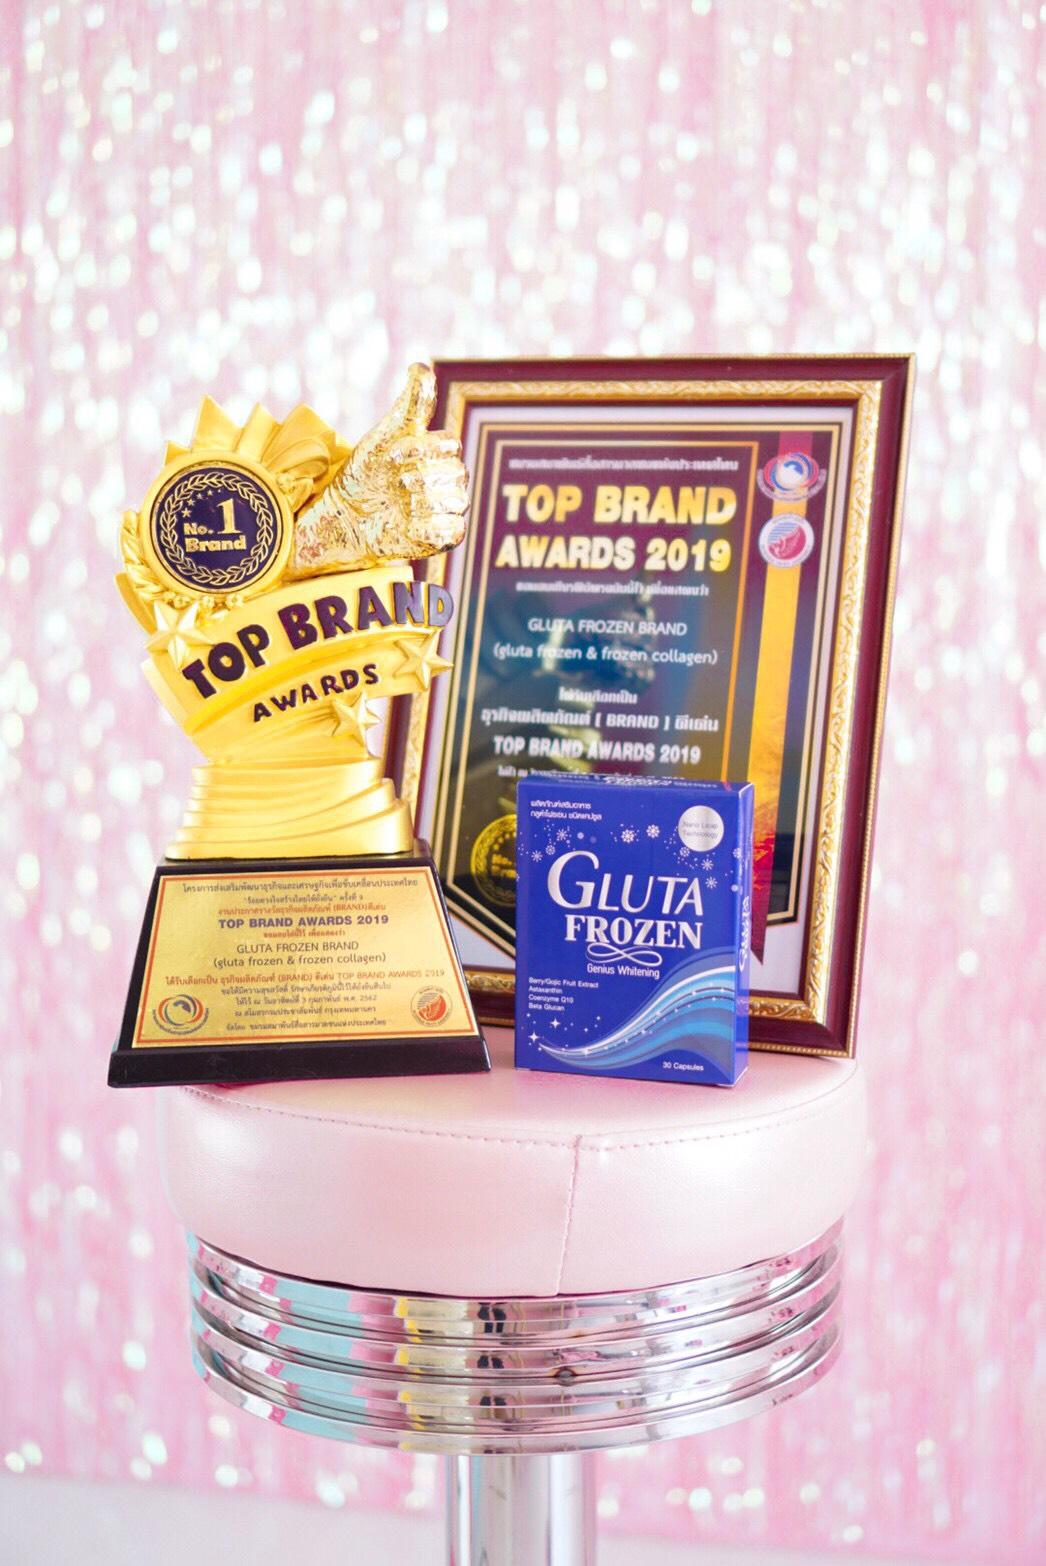 Gluta Frozen Singapore : Top Brands Award 2019 for Beauty